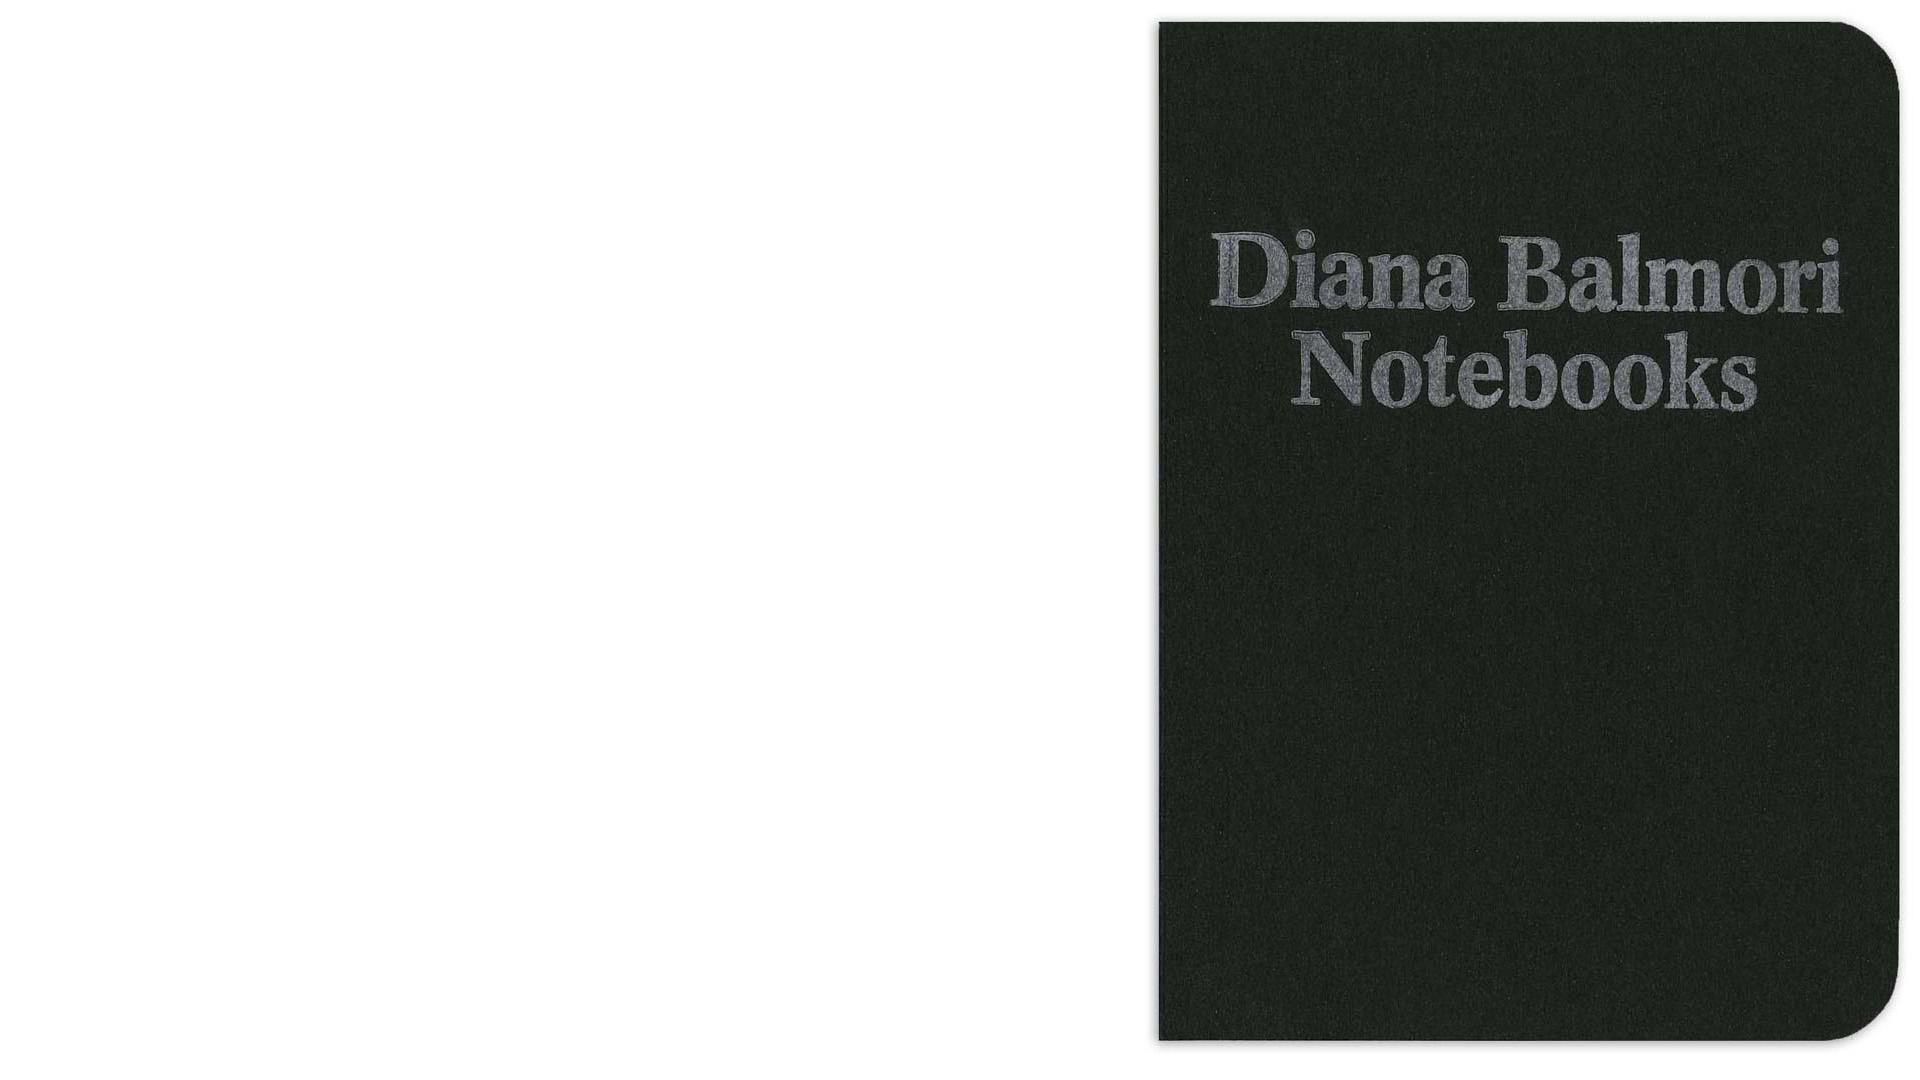 BA_DB-notebooks_coverspread_1080.jpg